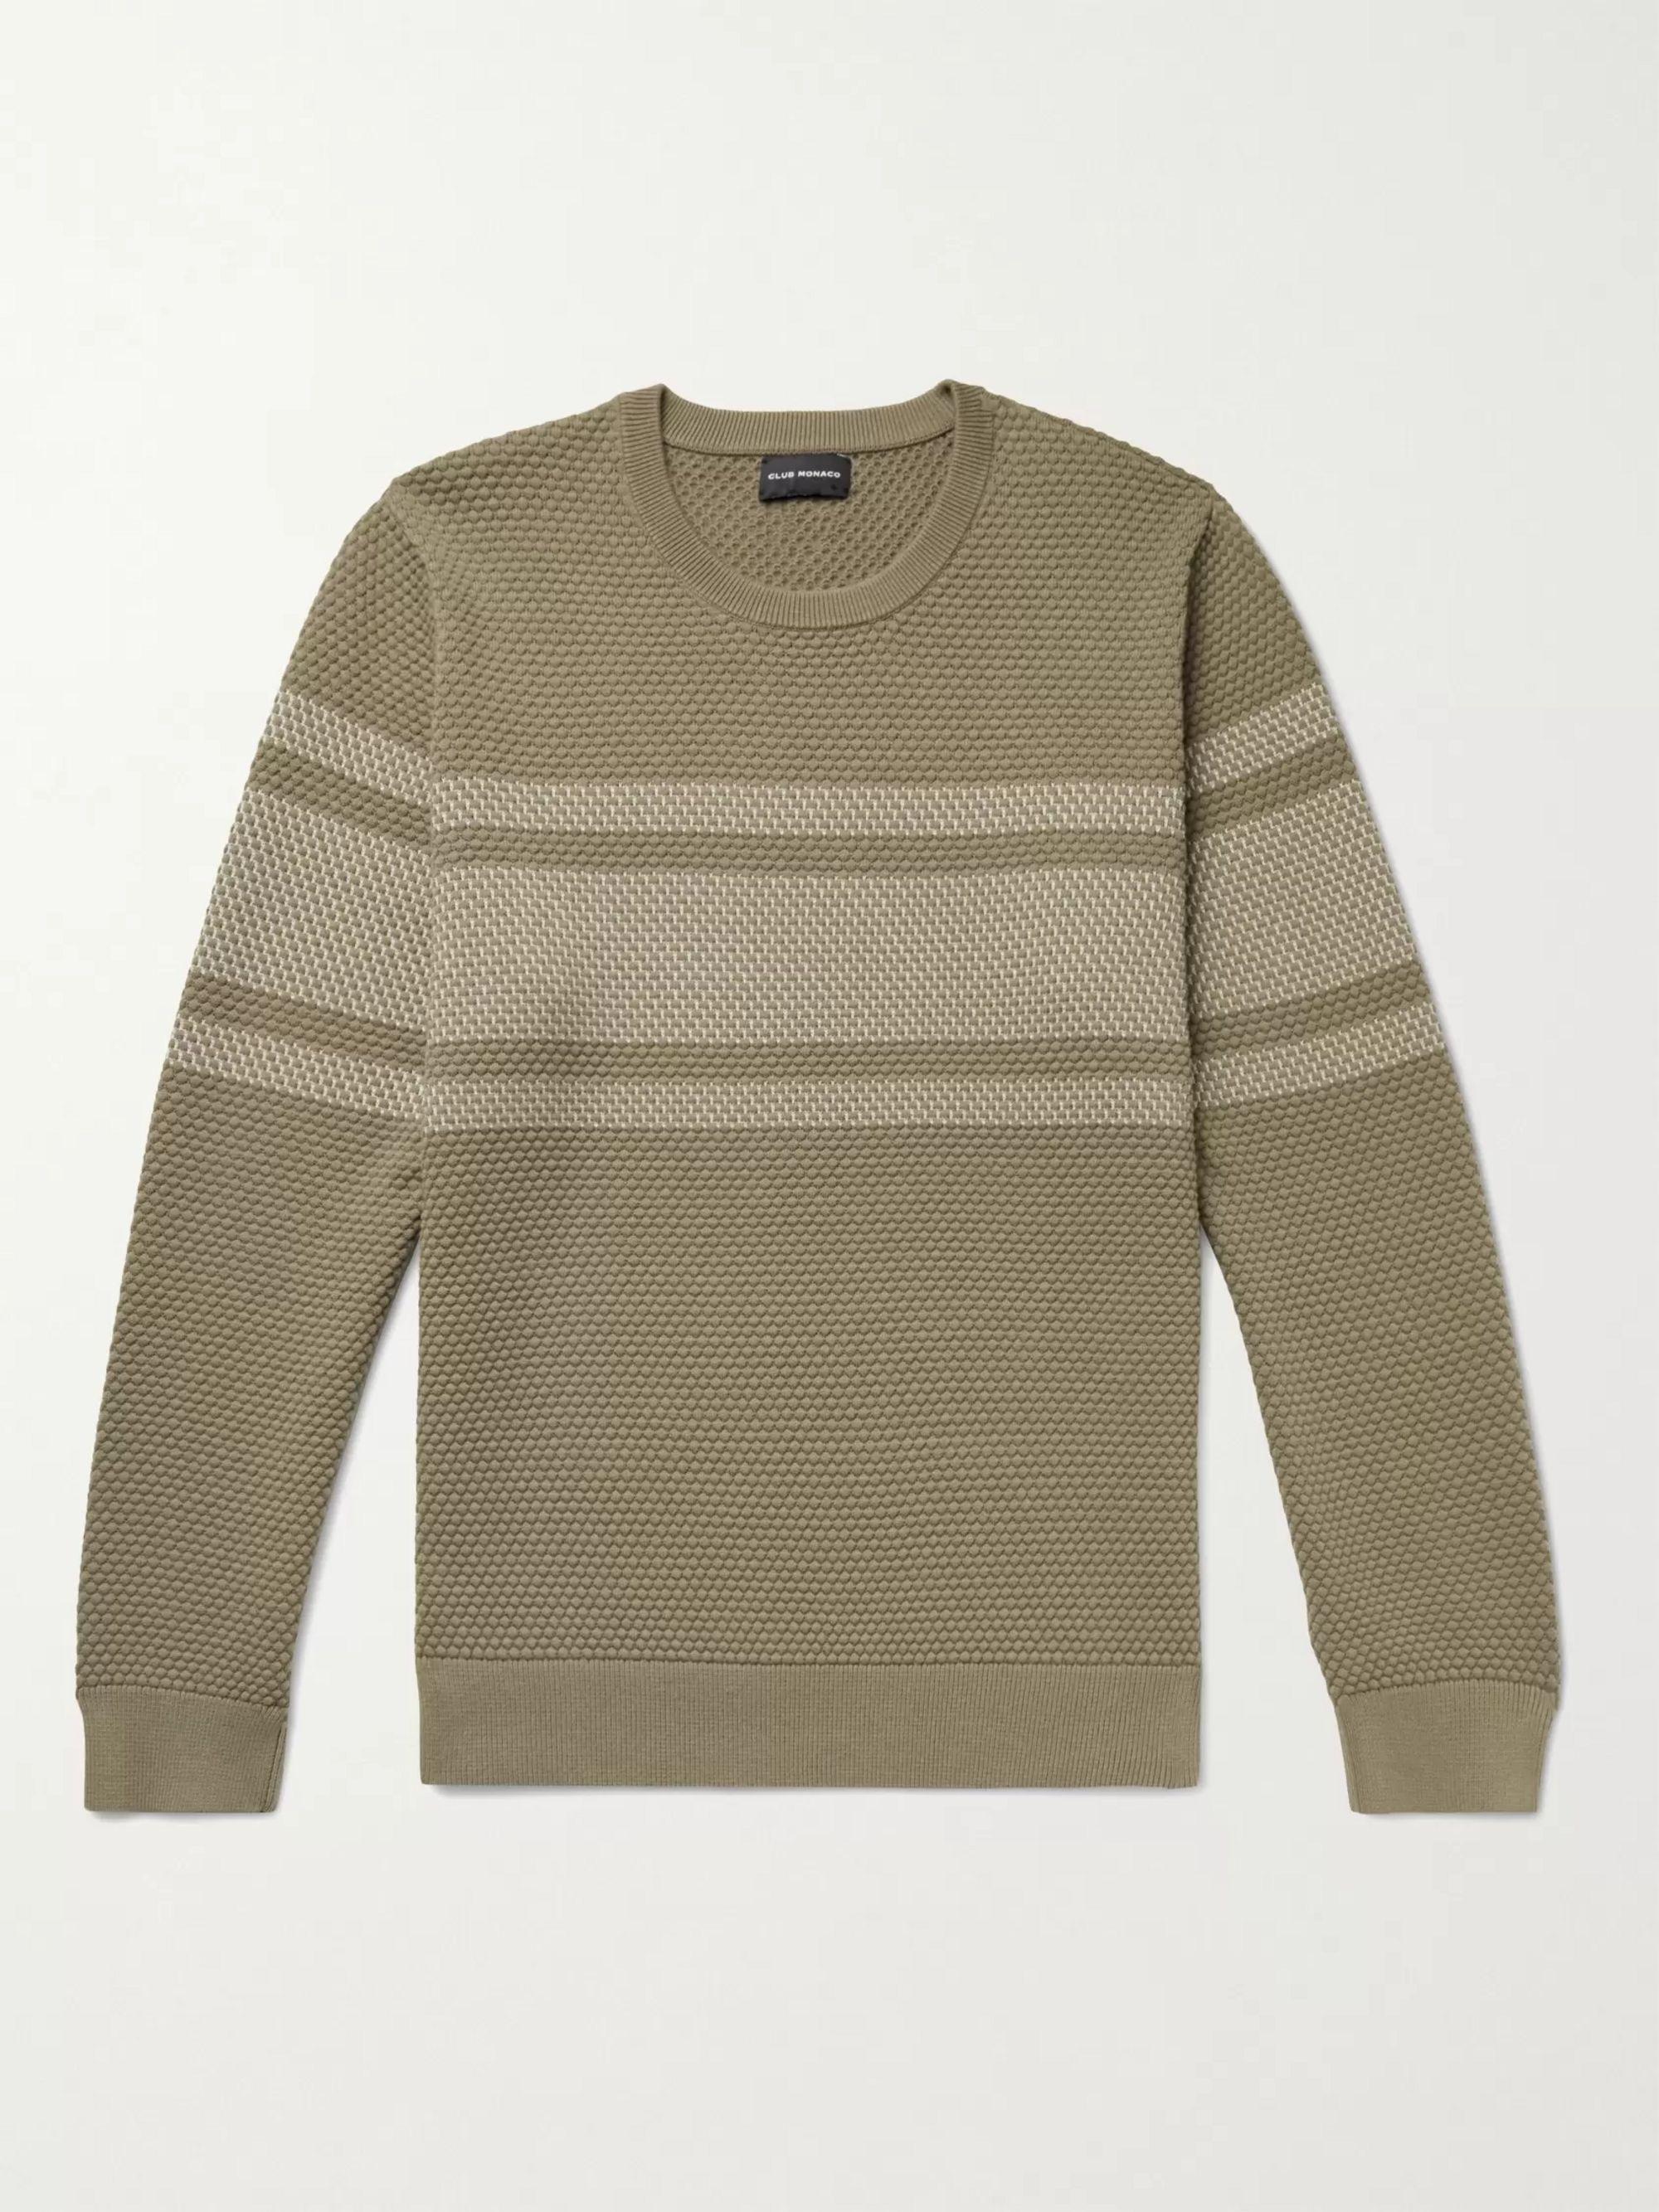 CLUB MONACO Striped Honeycomb-Knit Cotton-Blend Sweater